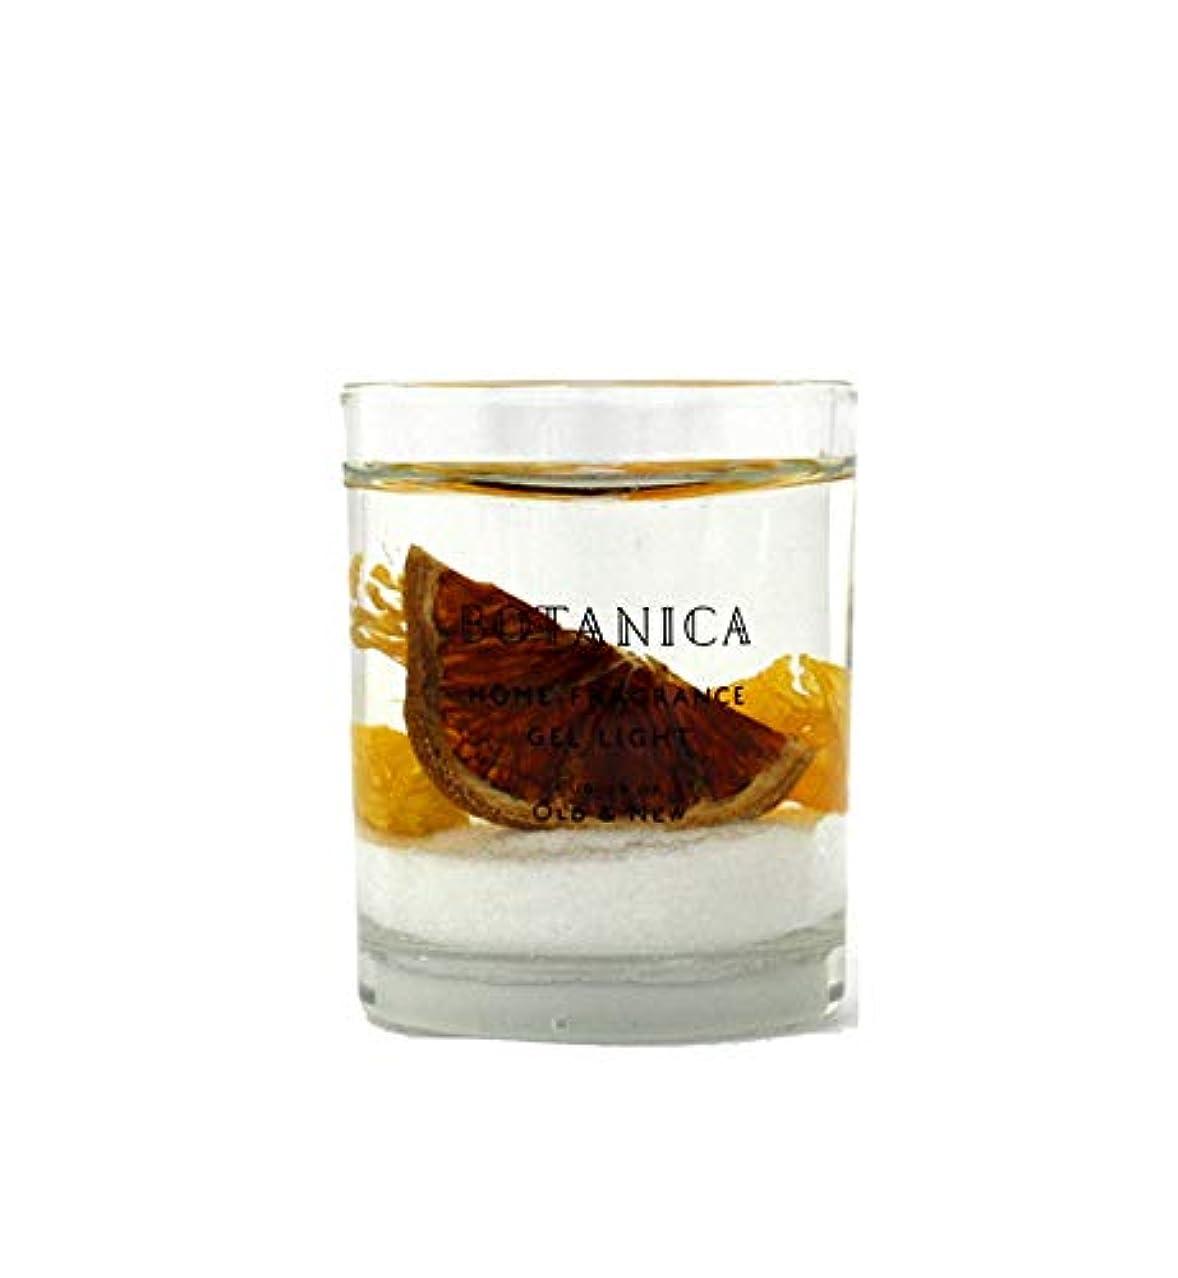 BOTANICA ハーバリウムジェルライト ブライトオレンジ Herbarium Gel Light Bright Orange ボタニカ